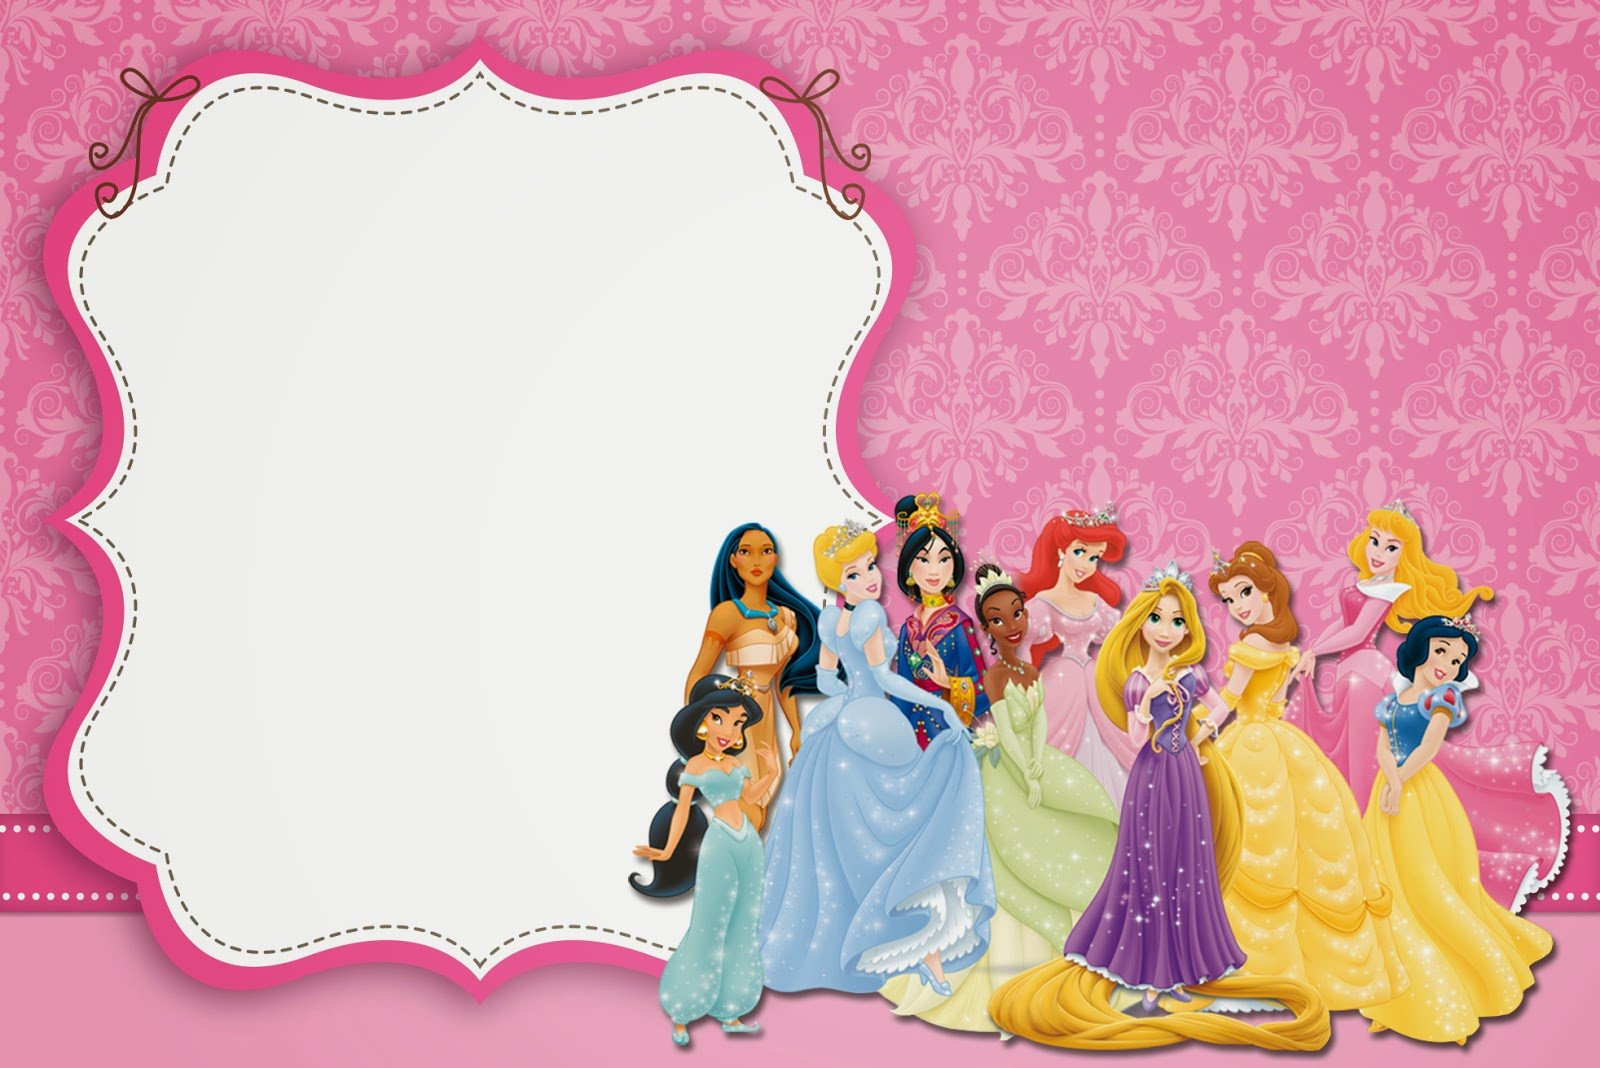 Disney Princess Invitation Template Disney Princess Party Free Printable Party Invitations